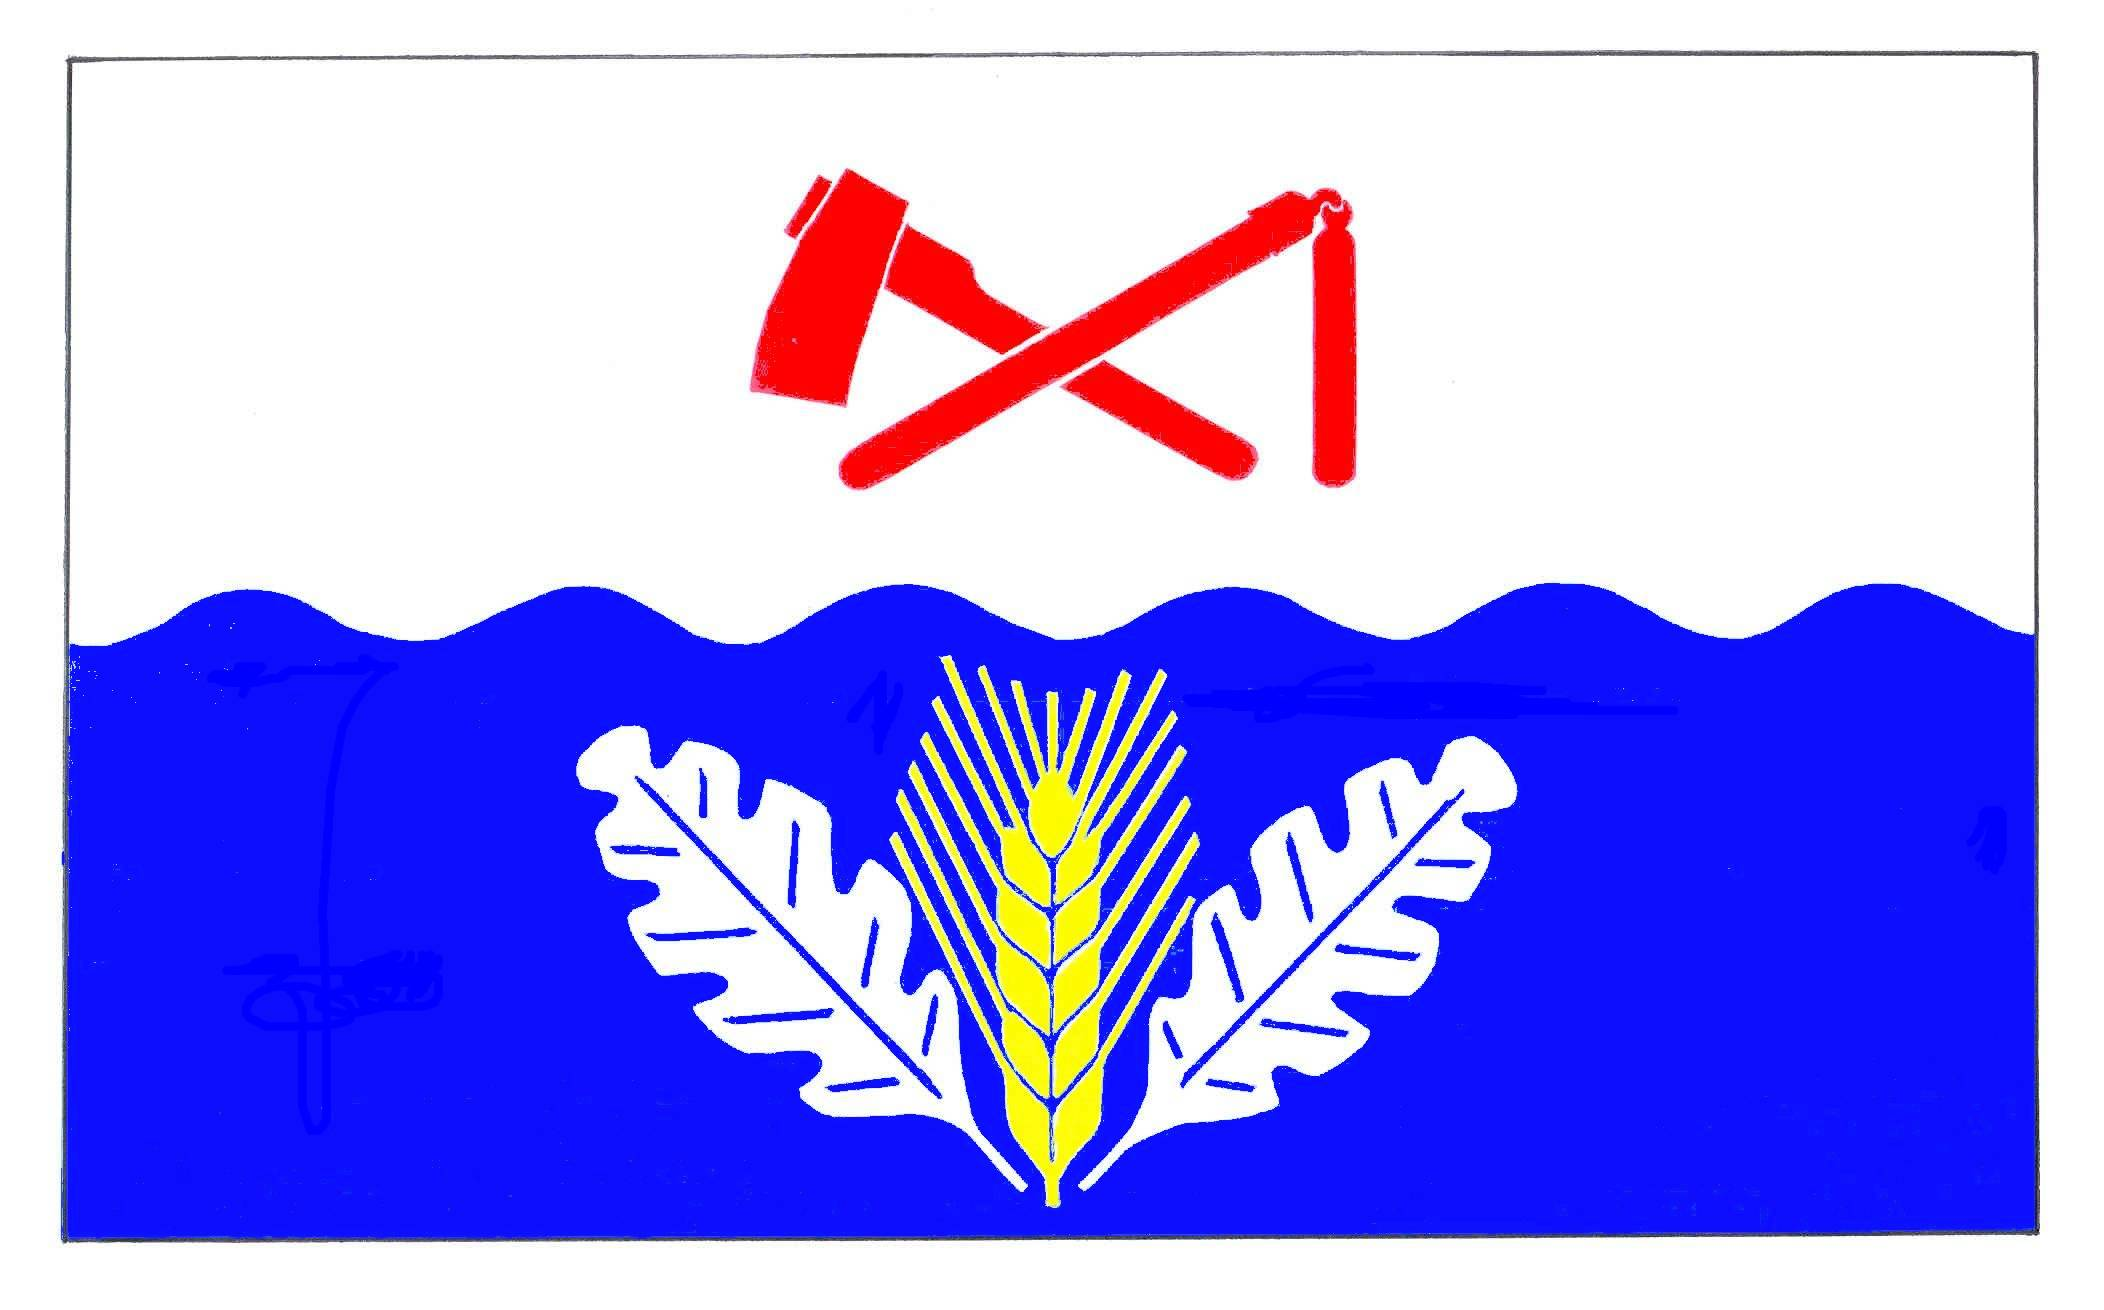 Flagge GemeindeDannau, Kreis Plön